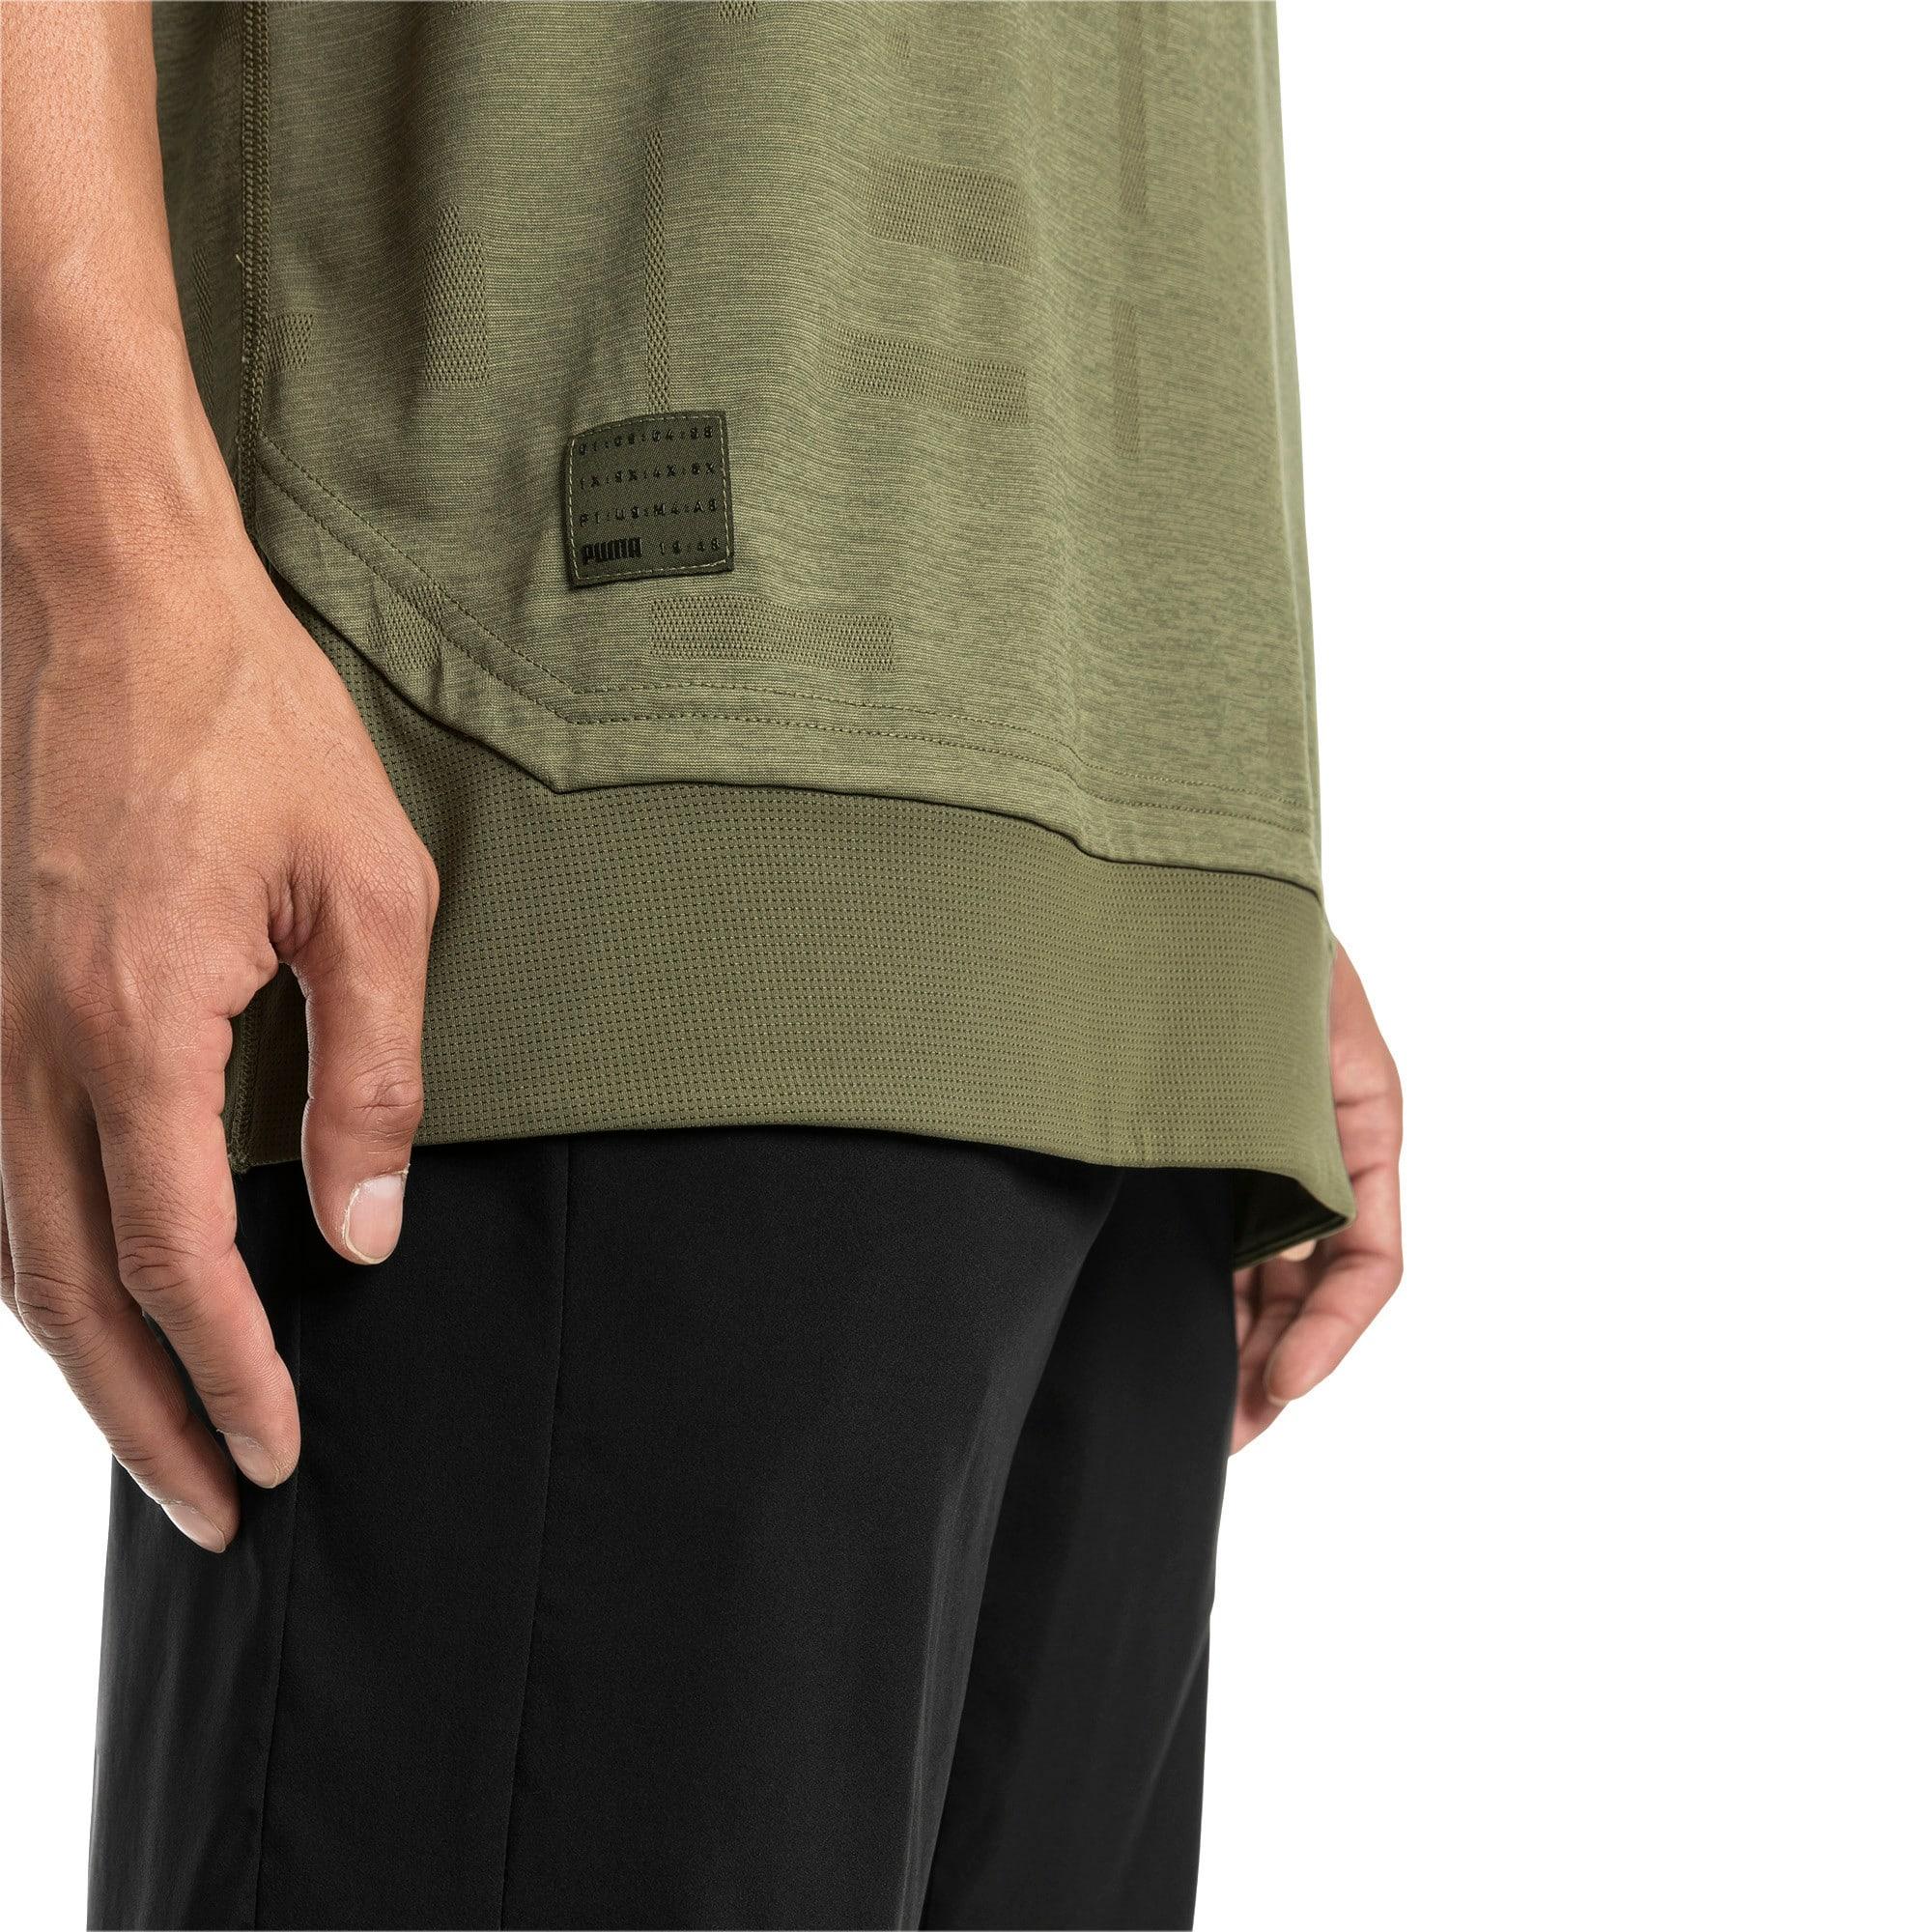 Thumbnail 4 of Energy Short Sleeve Tech Men's Training Tee, Olivine, medium